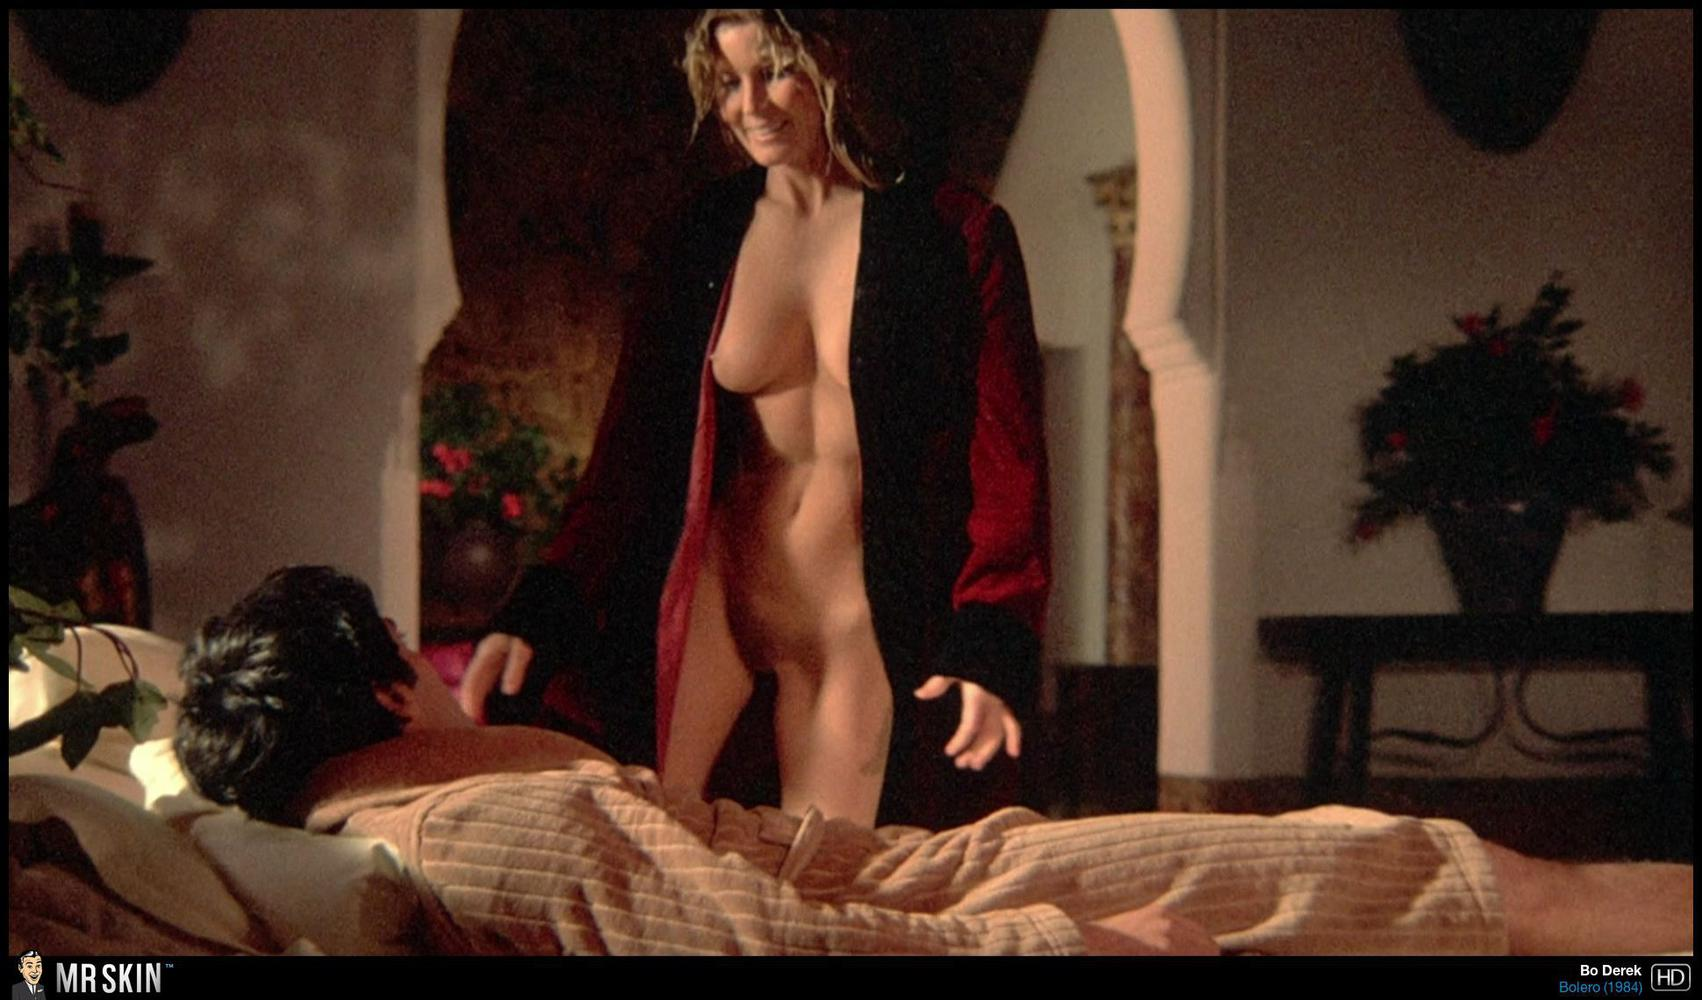 tbt to bo derek's bodacious nudity